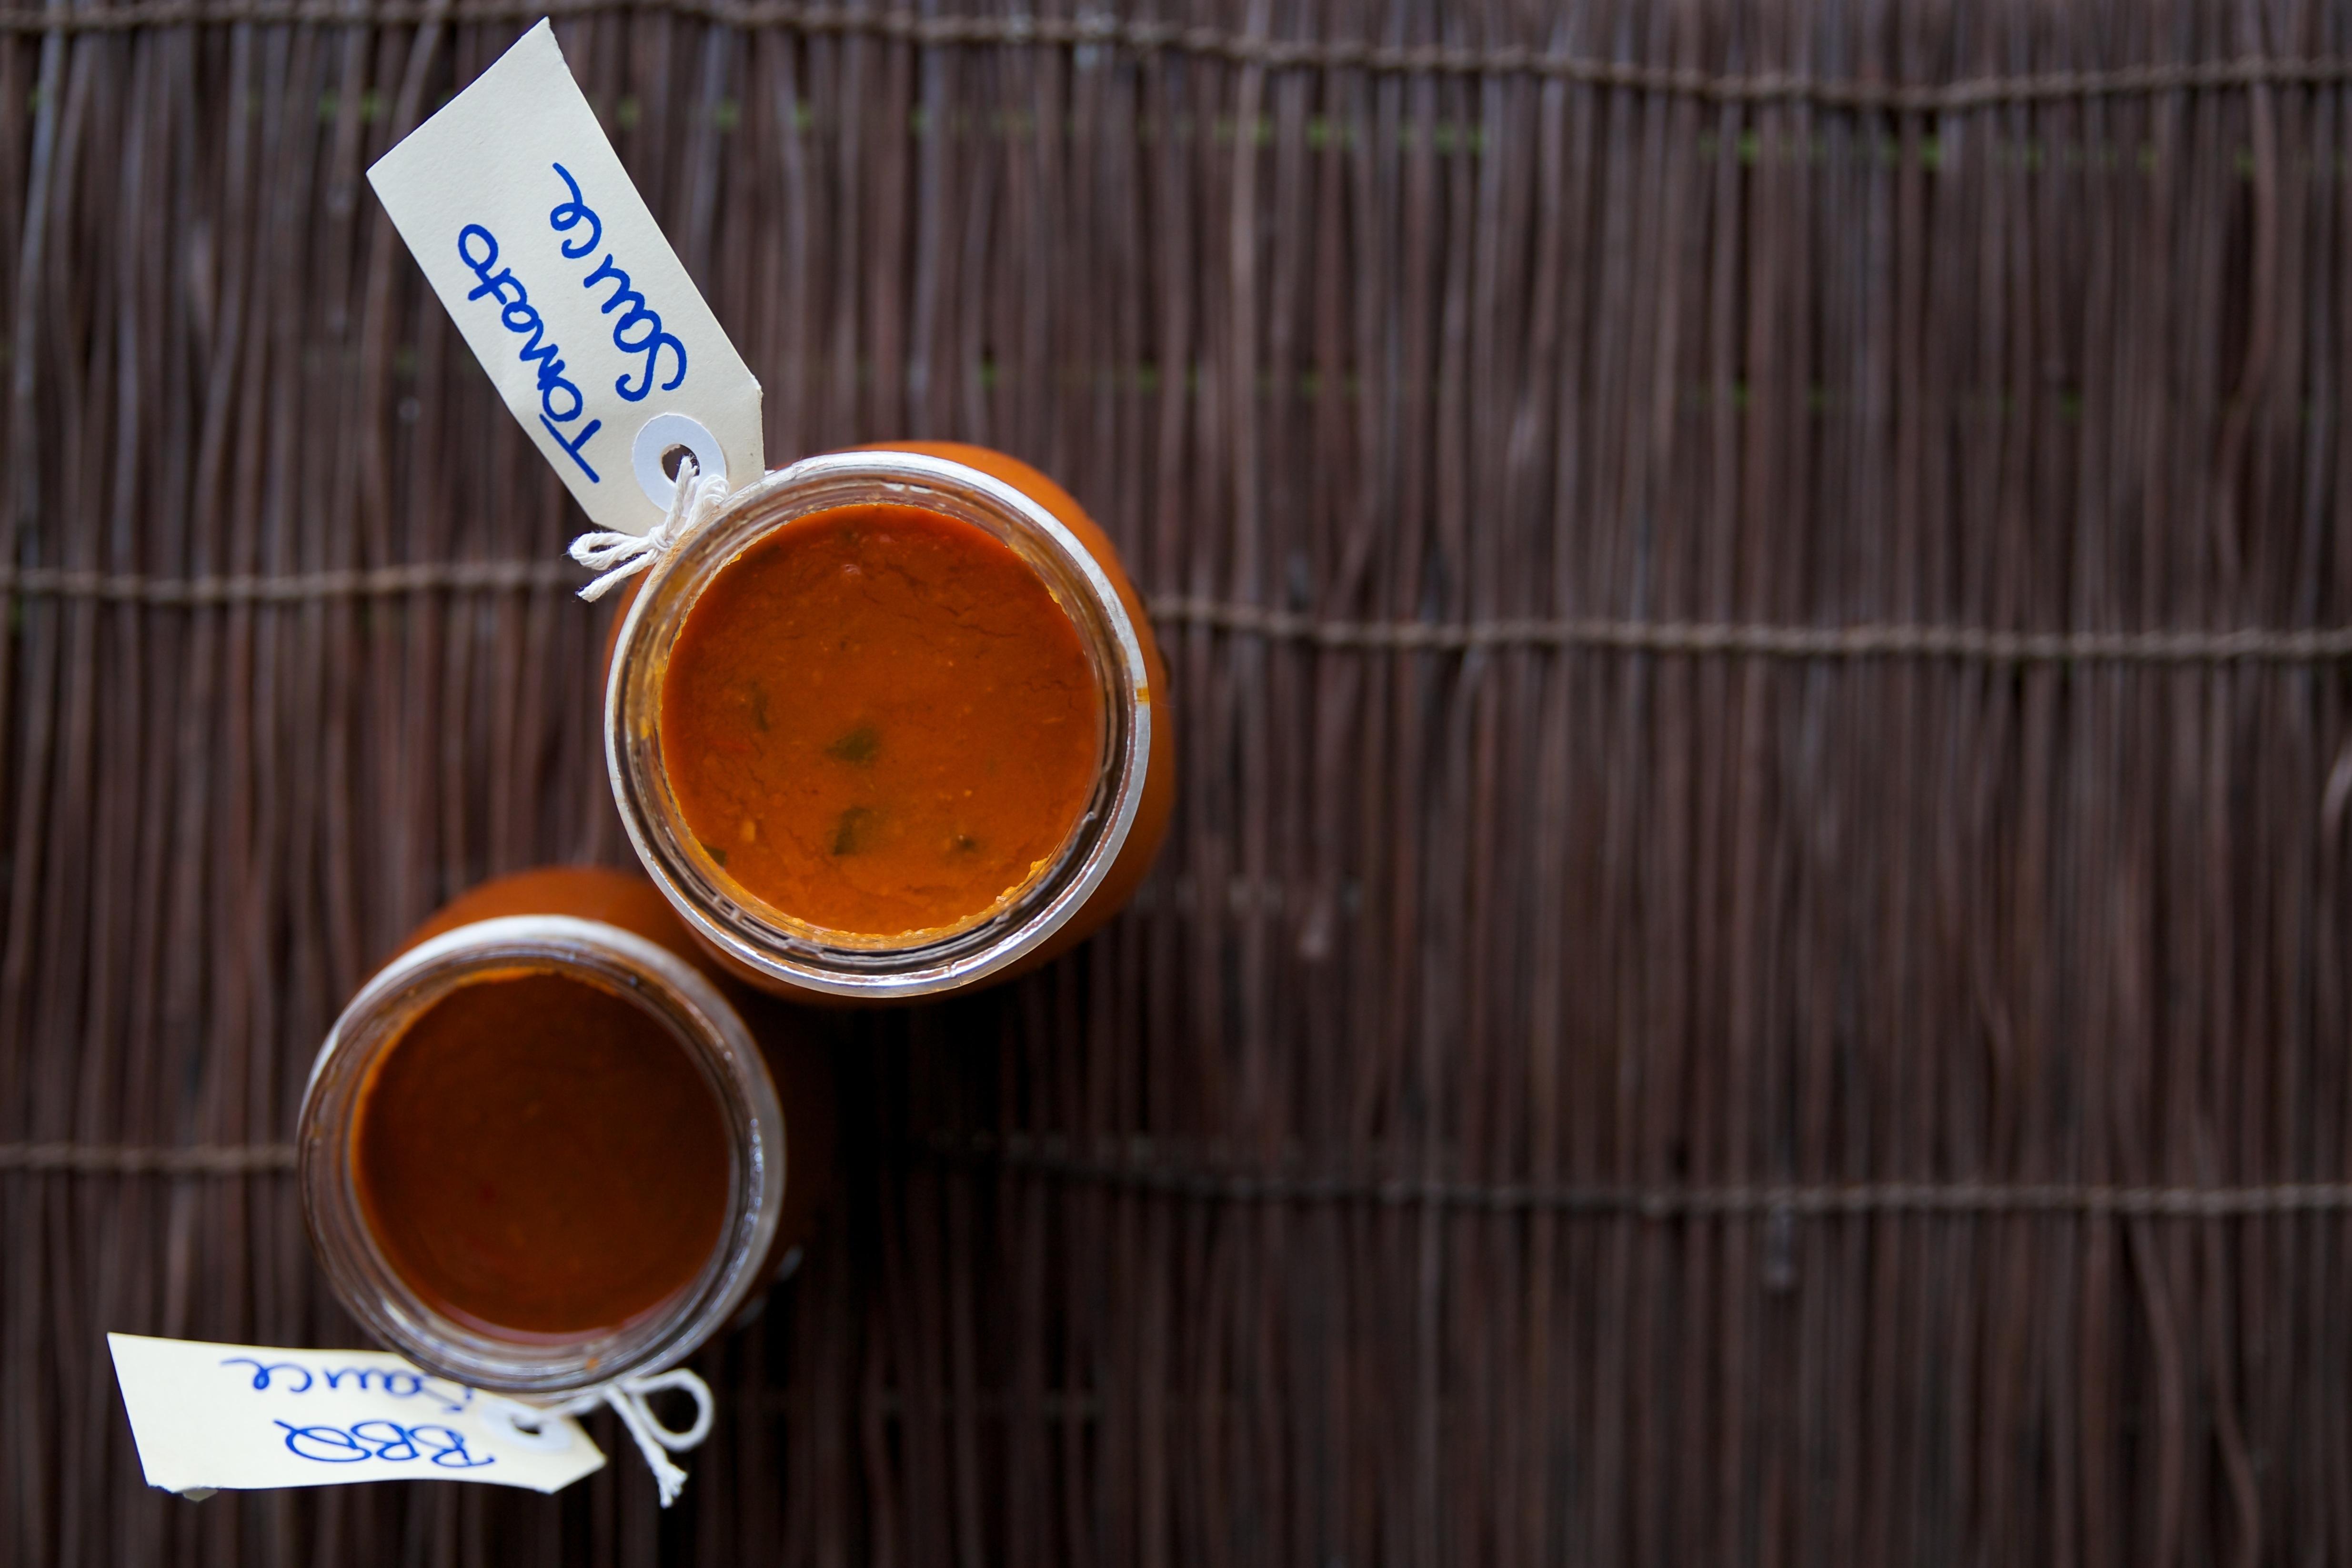 Tomato Sauce & BBQ Sauce